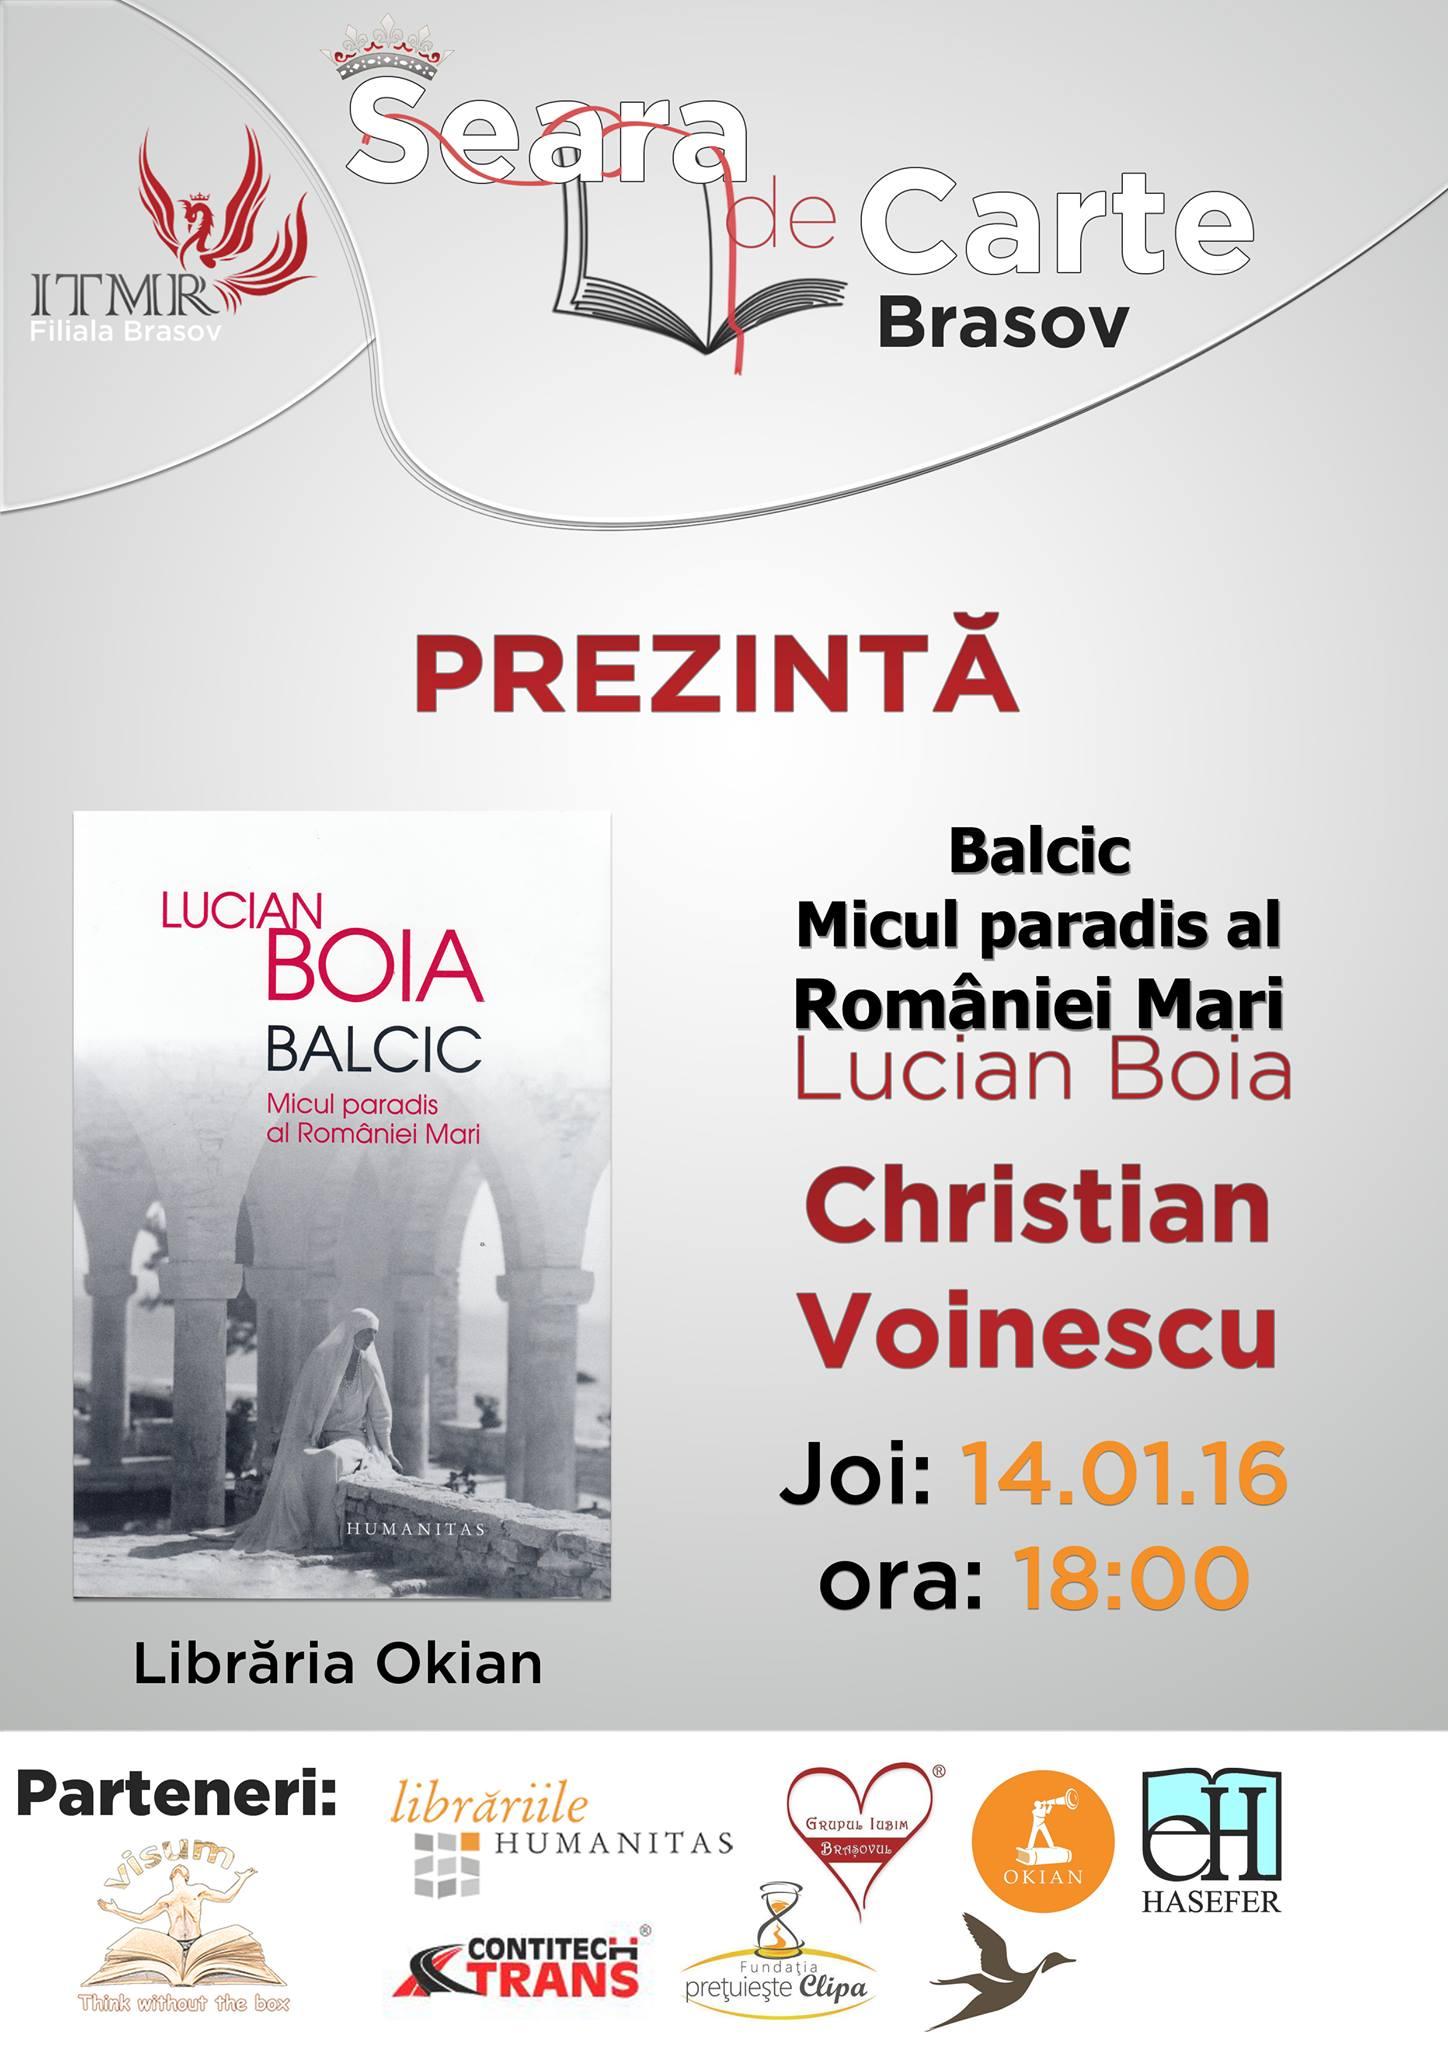 Seara de Carte Brasov - Balcic